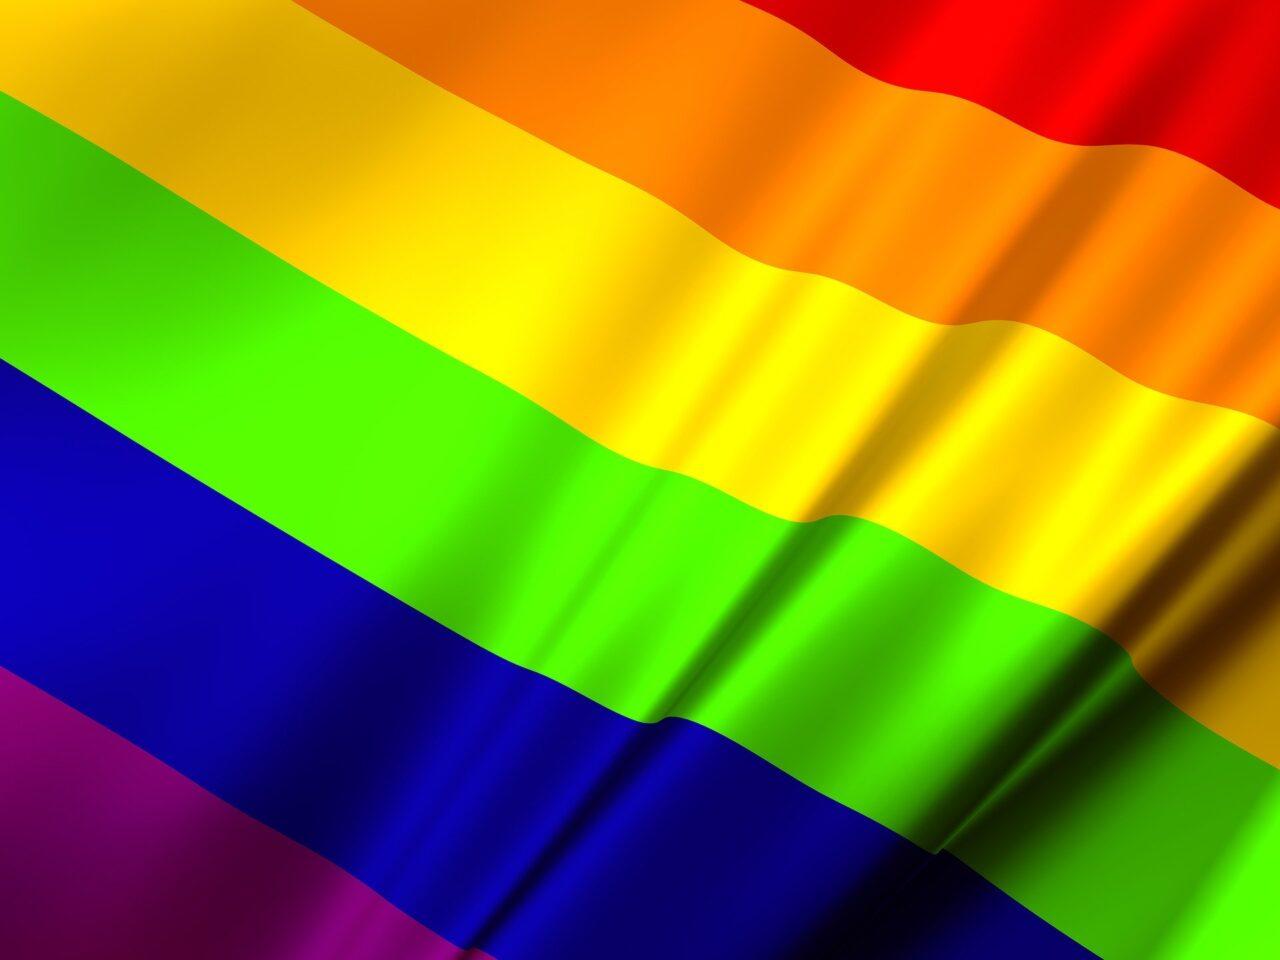 Svizzera referendum omofobia Omotransfobia